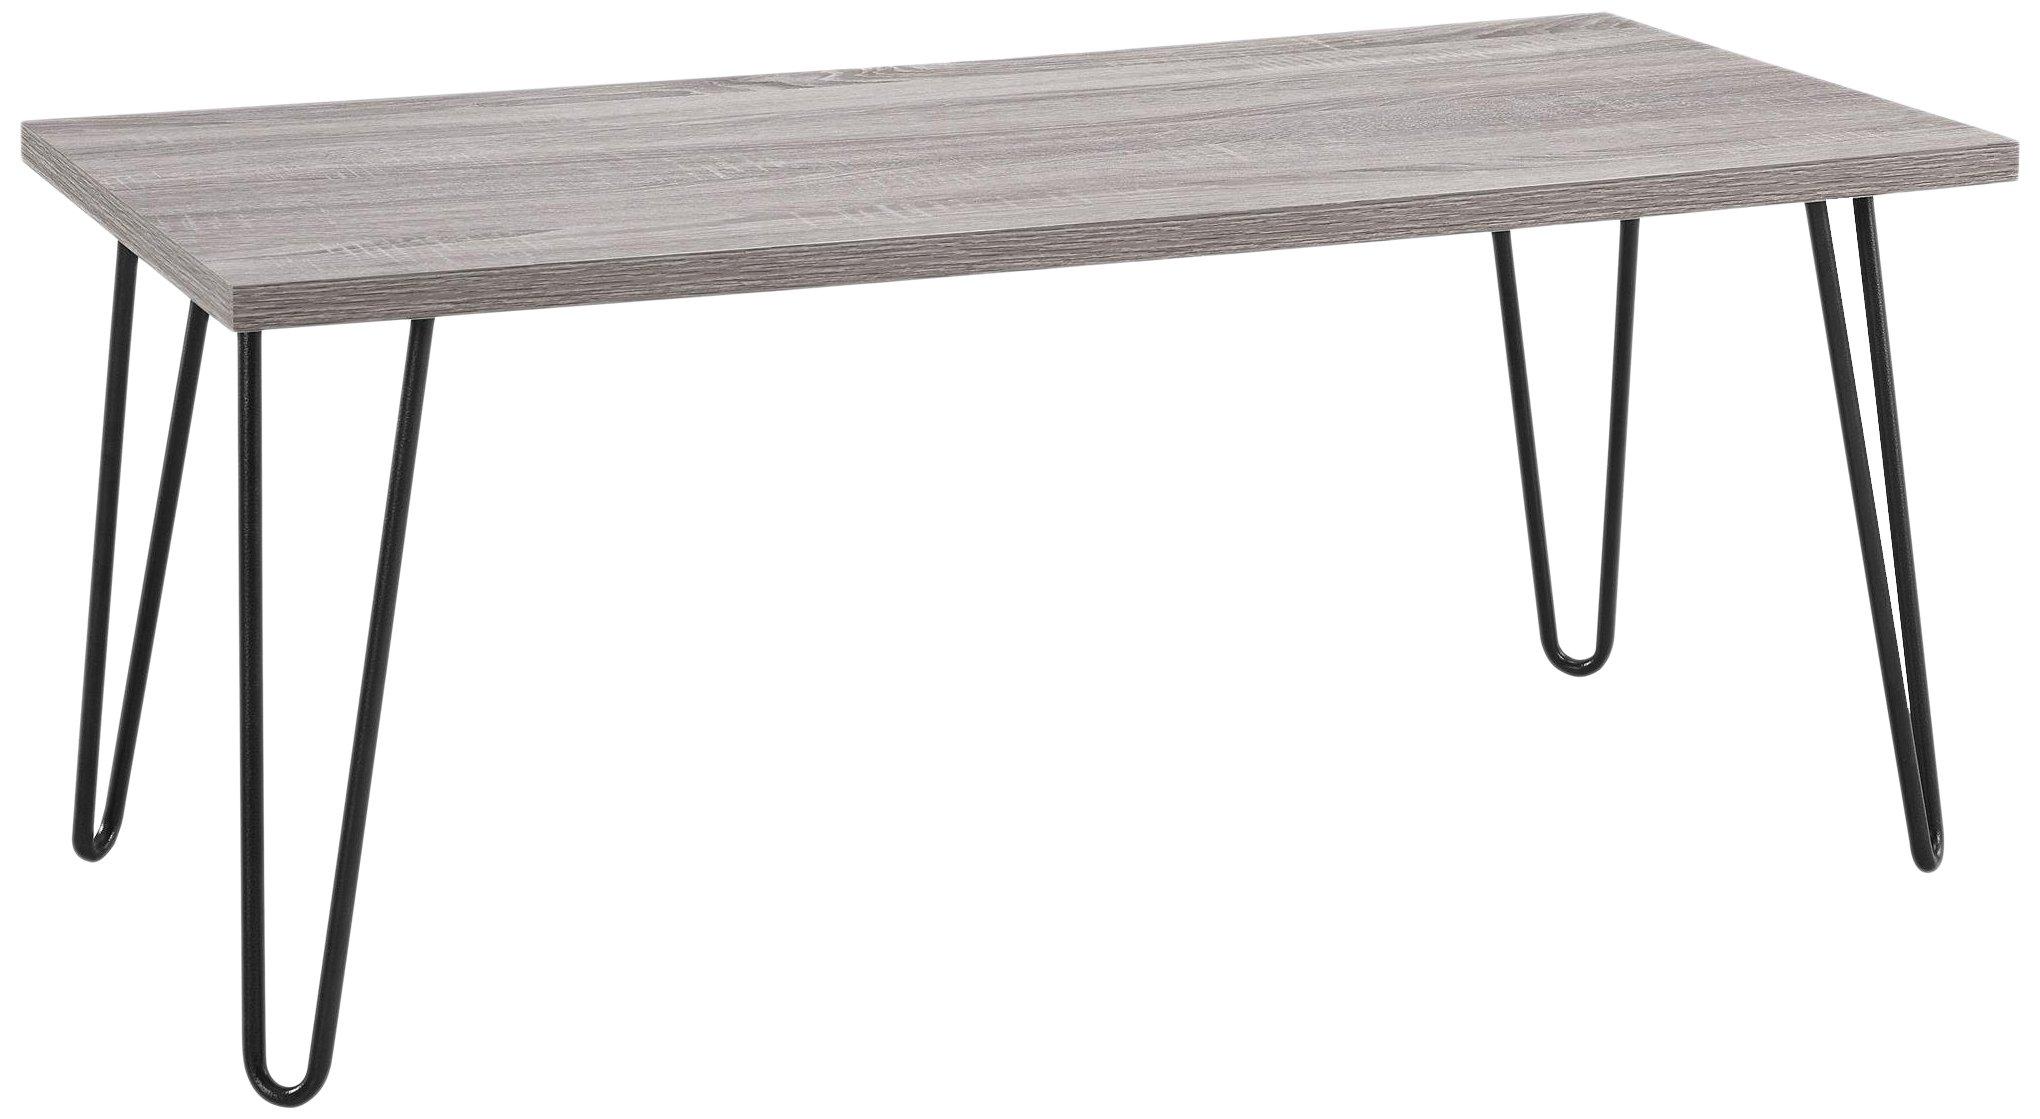 Ameriwood Home Owen Retro Coffee Table Metal Legs, Sonoma Oak Gunmetal Gray